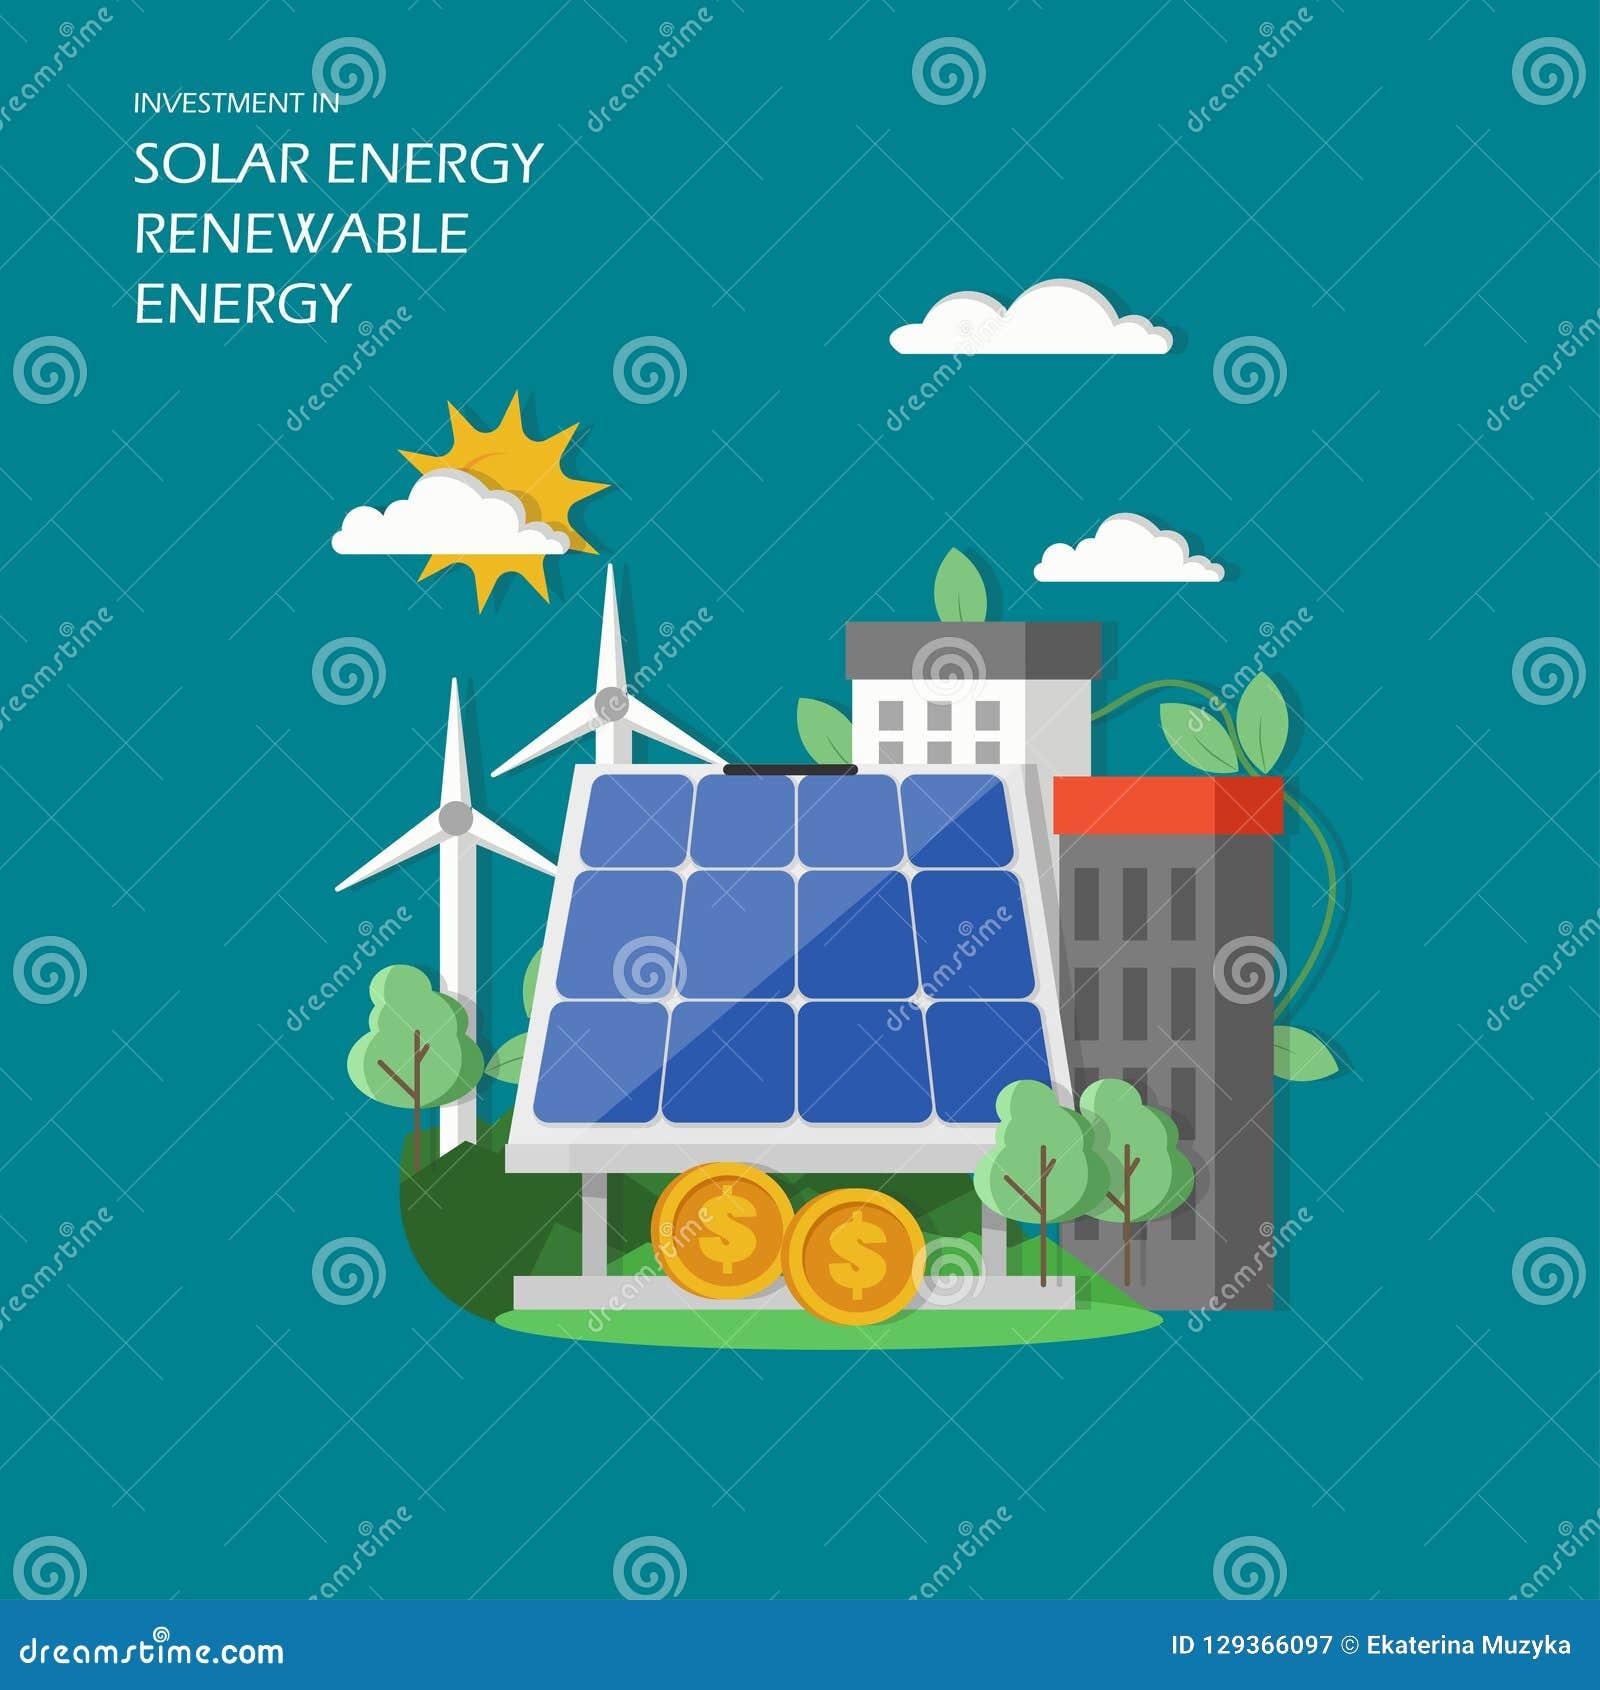 Investment In Solar Renewable Energy Vector Illustration